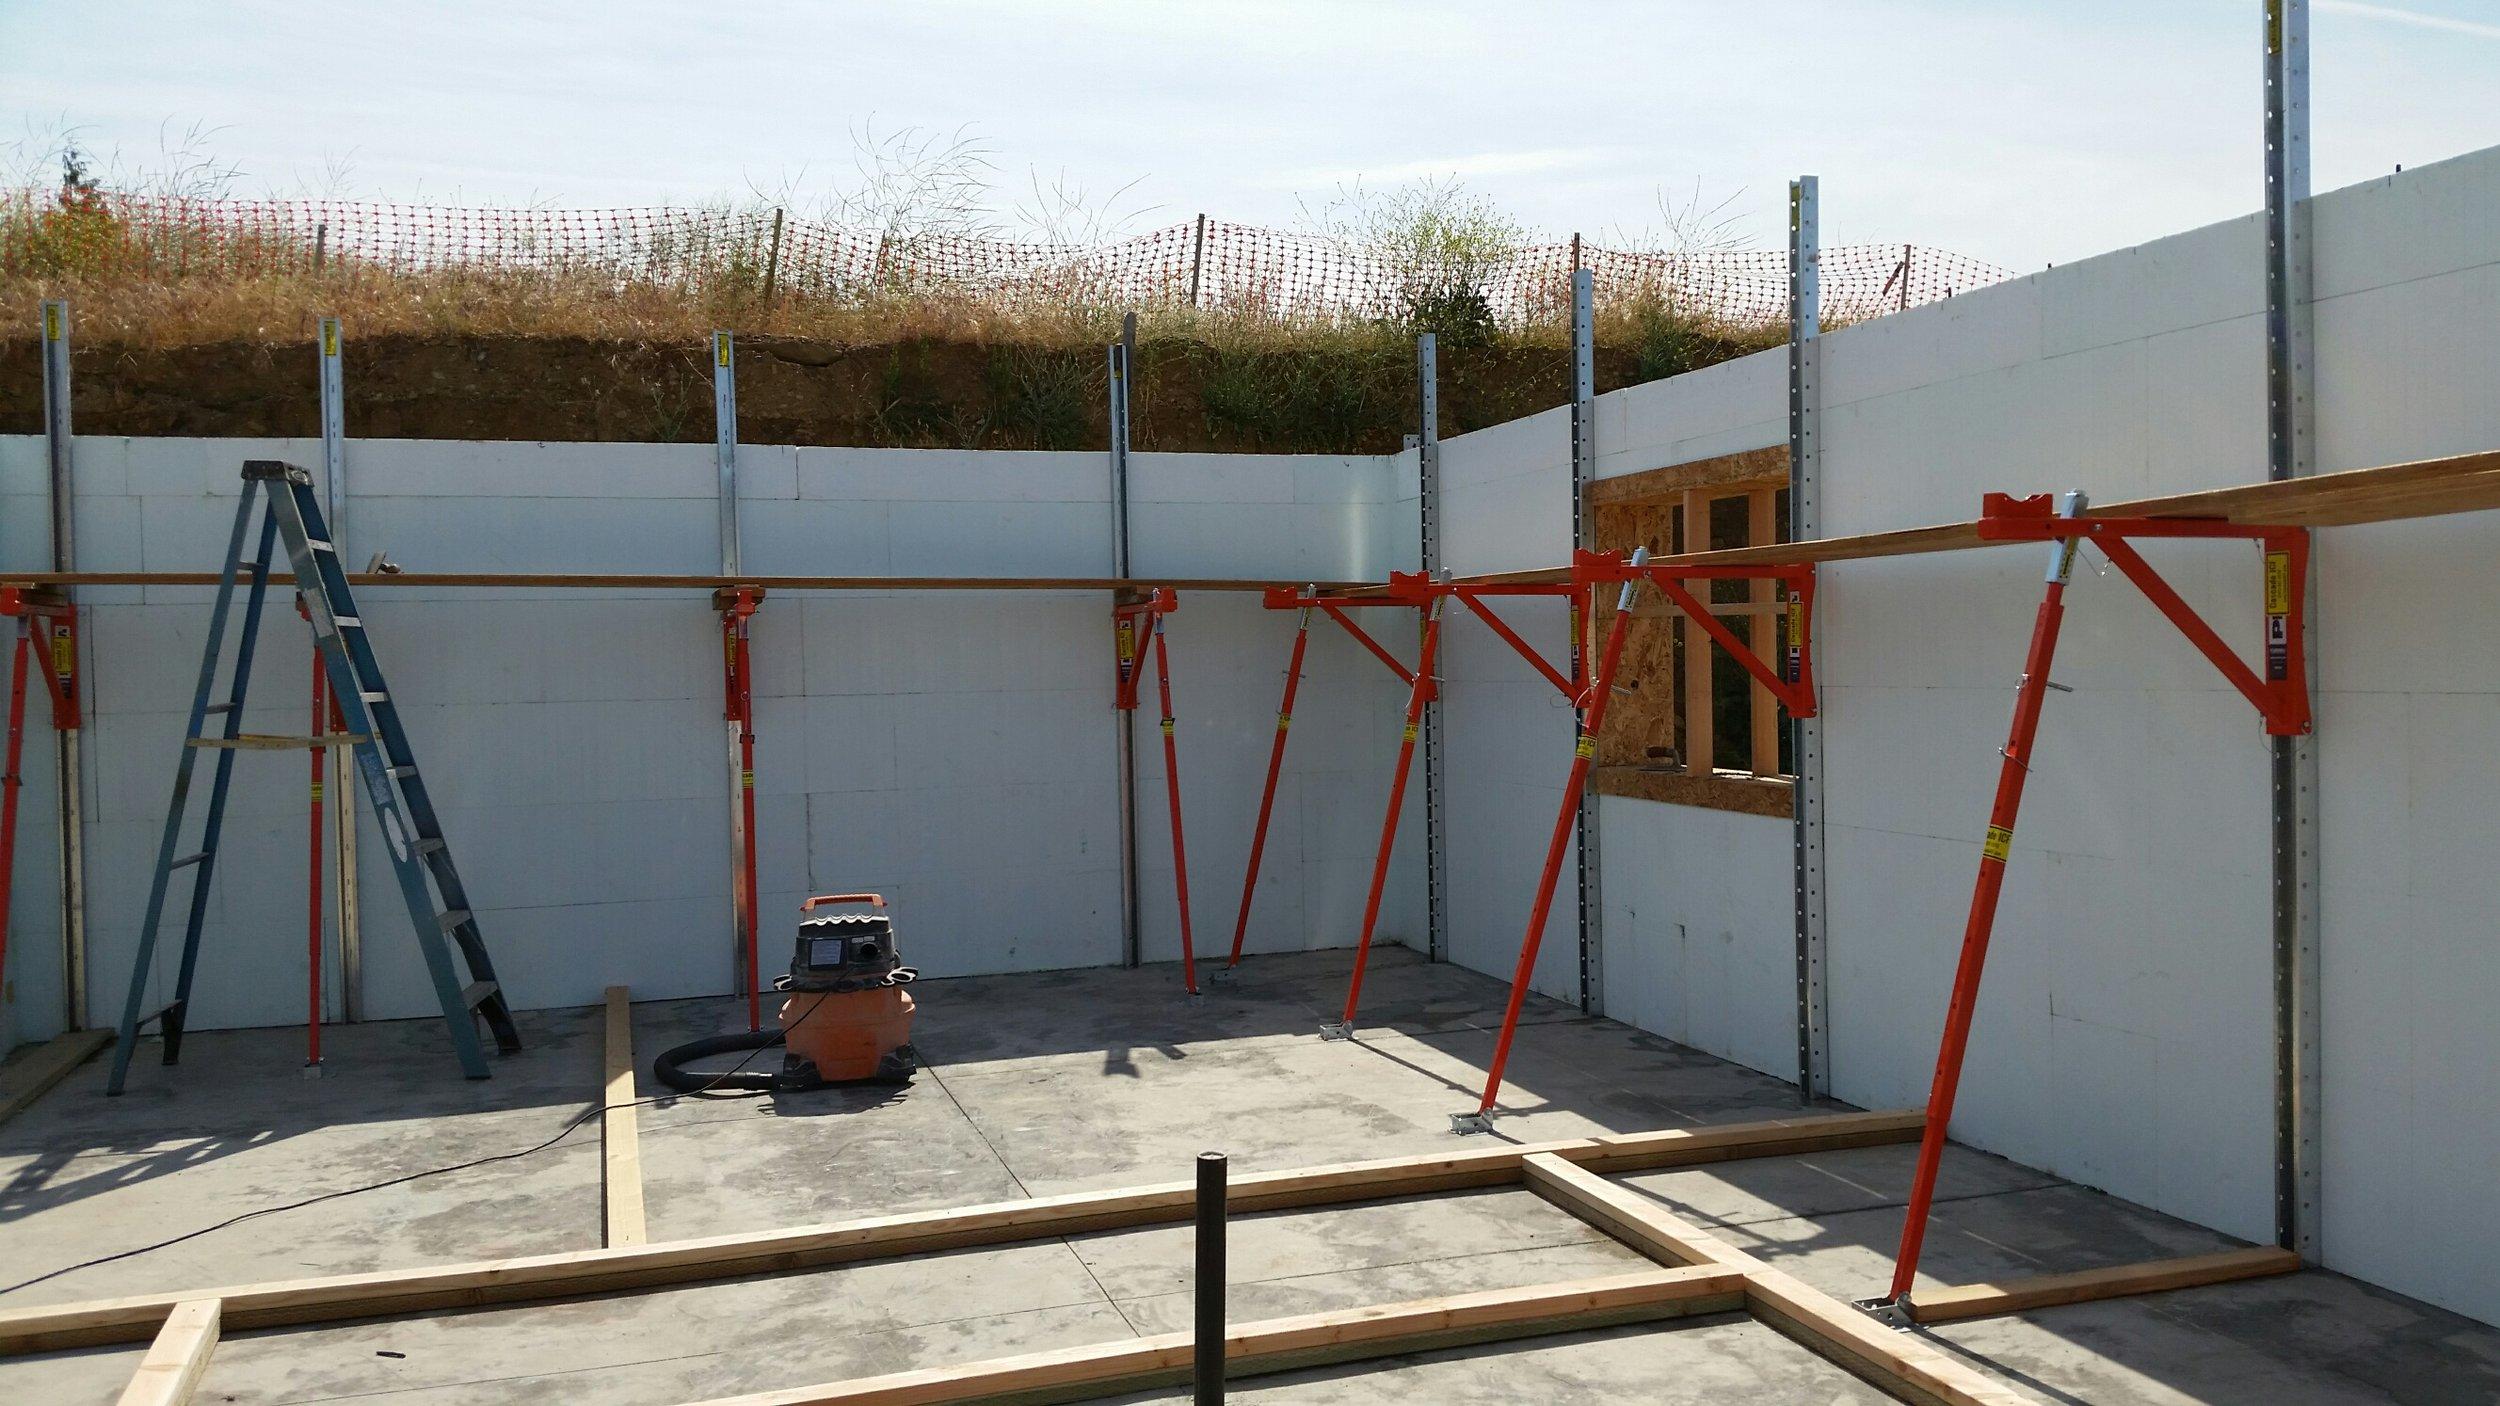 Monroe Construction in Medford, OR